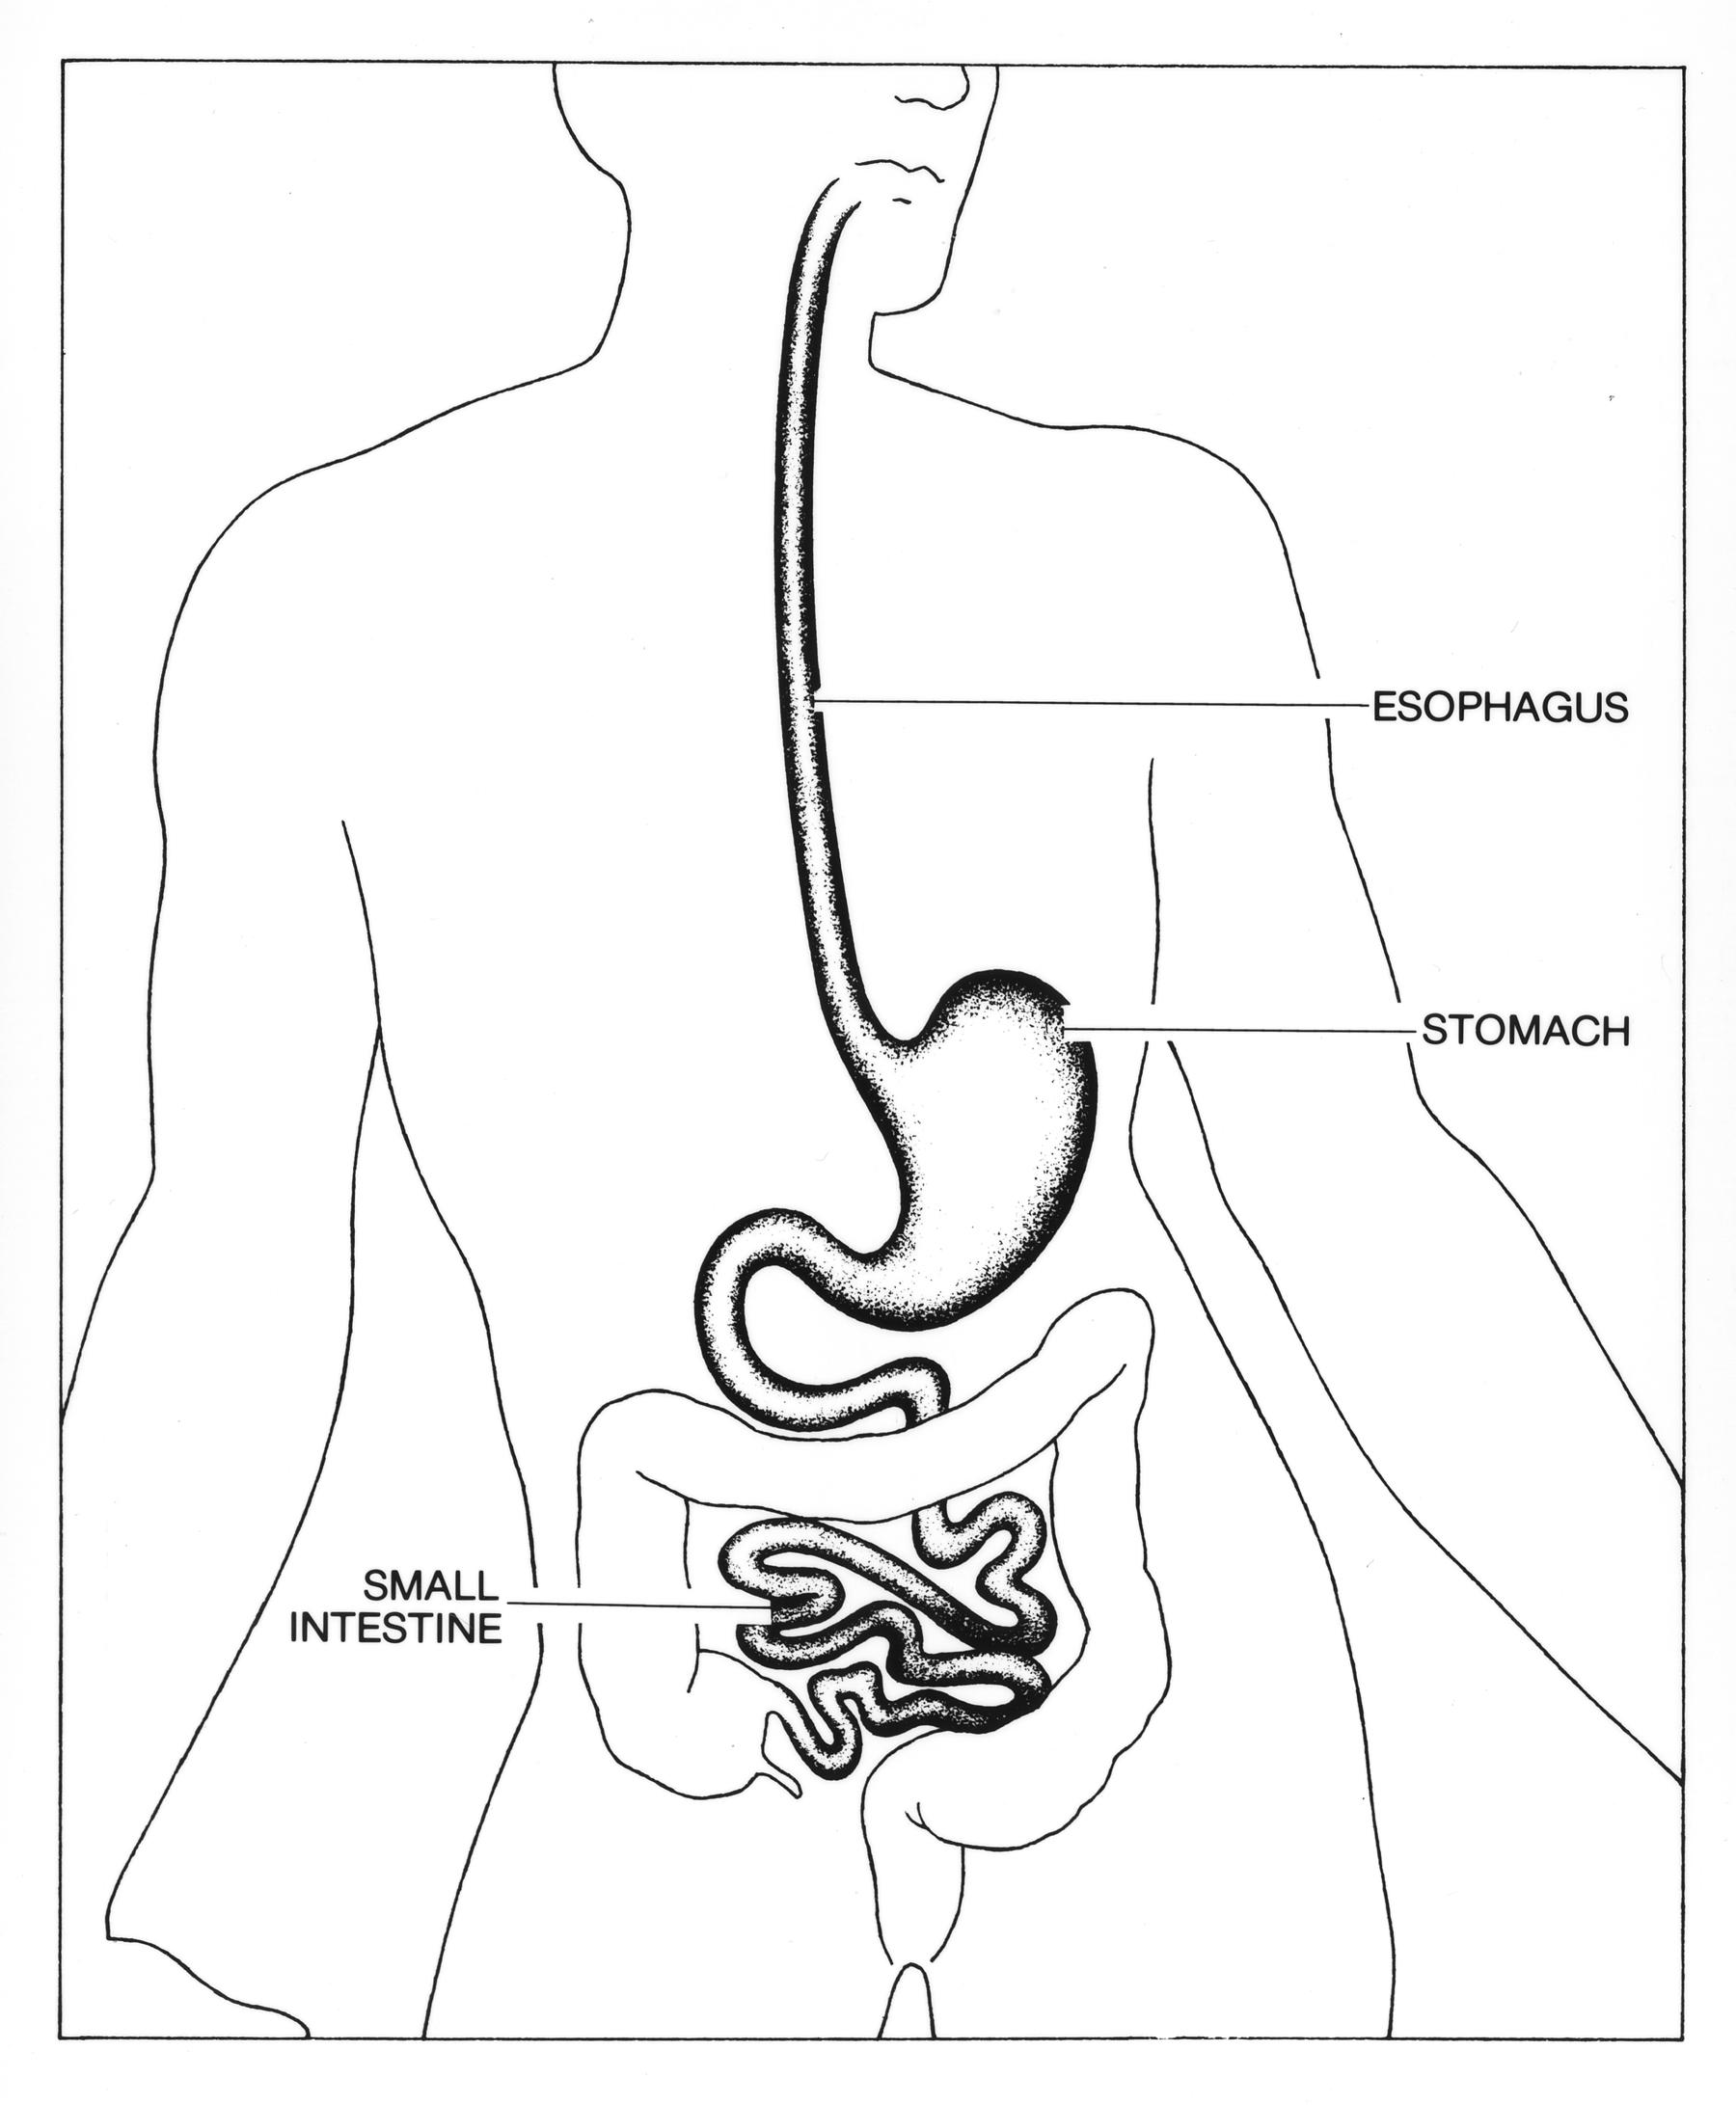 File Esophagus Stomach Small Intestine